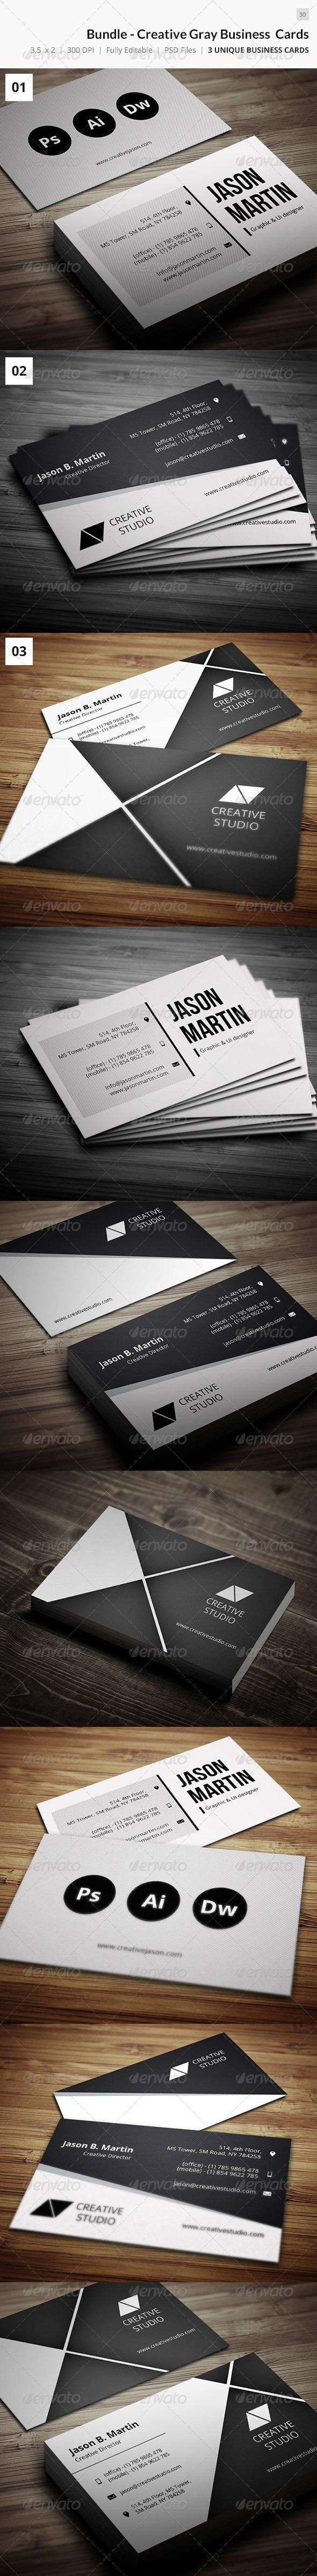 Bundle Creative Grey Business Cards 30